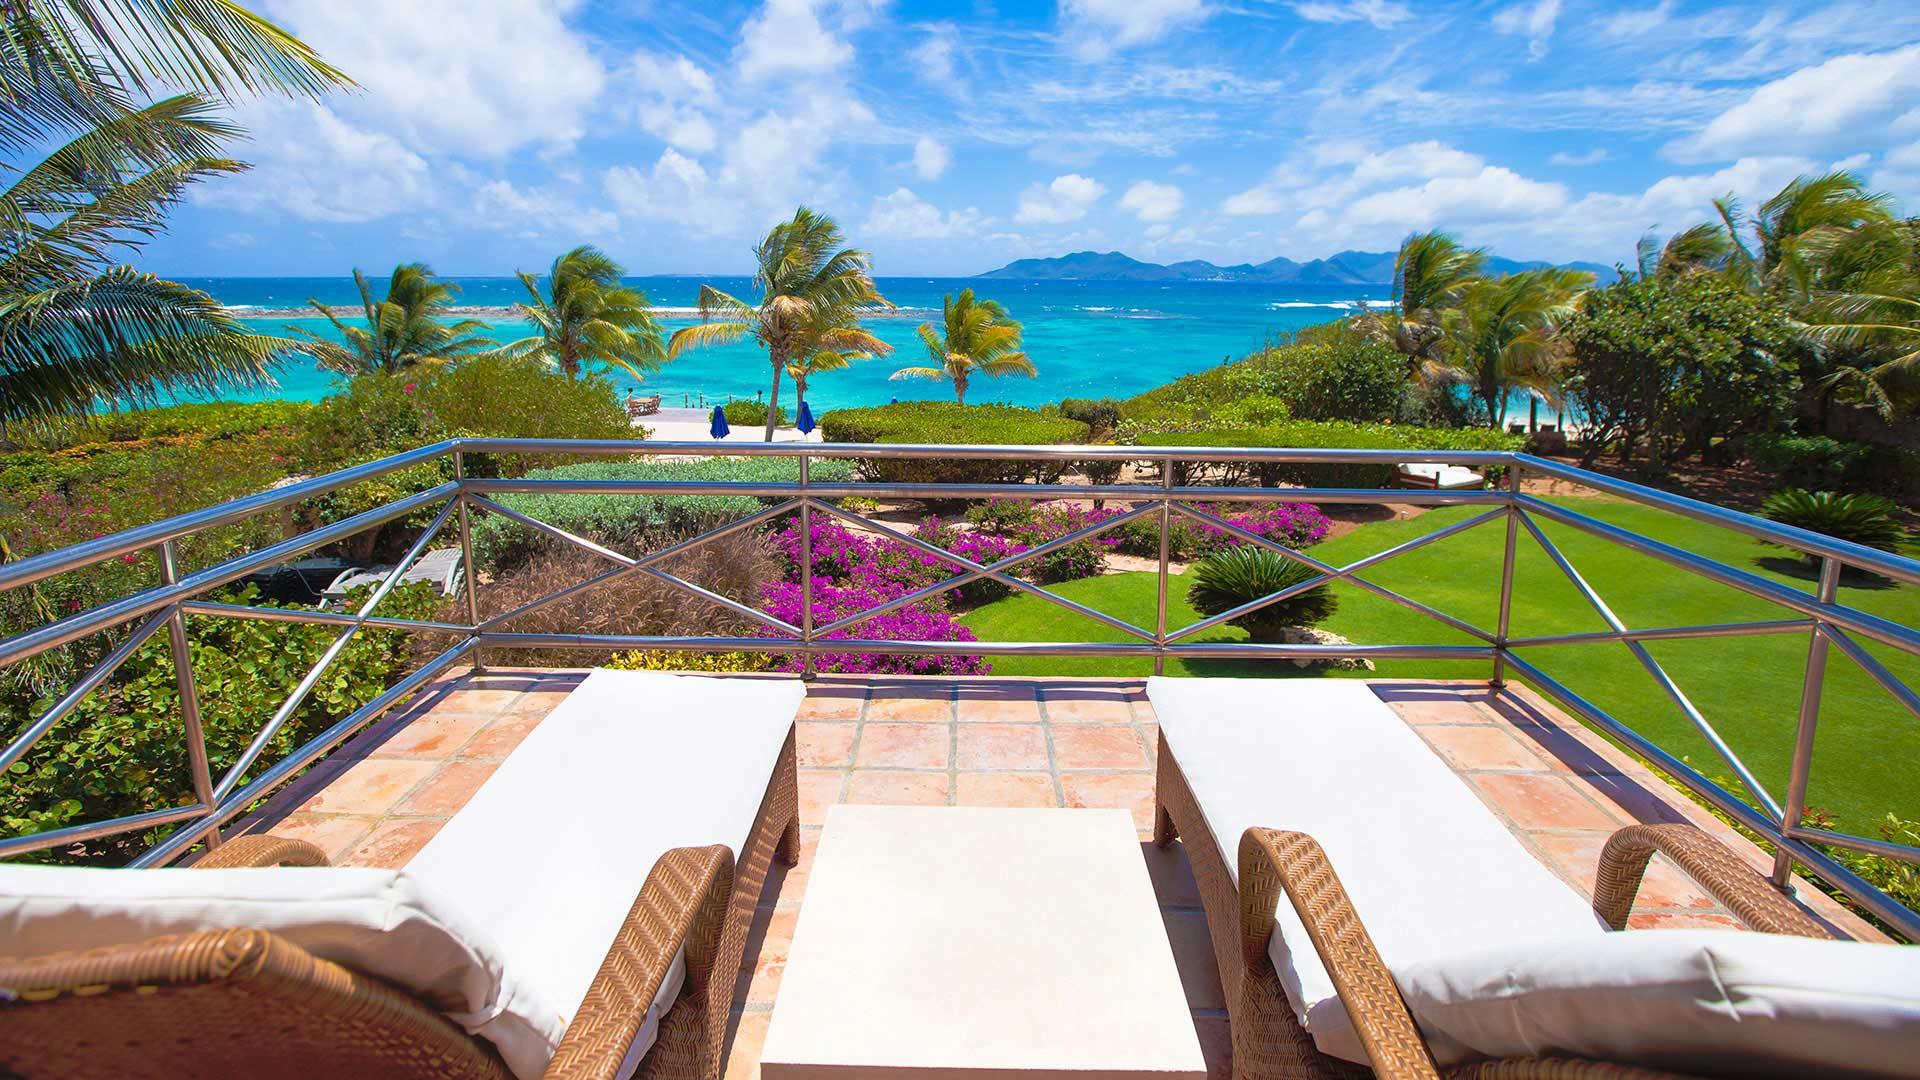 Indigo Villa Anguilla Rental Properties in Paradise terrace